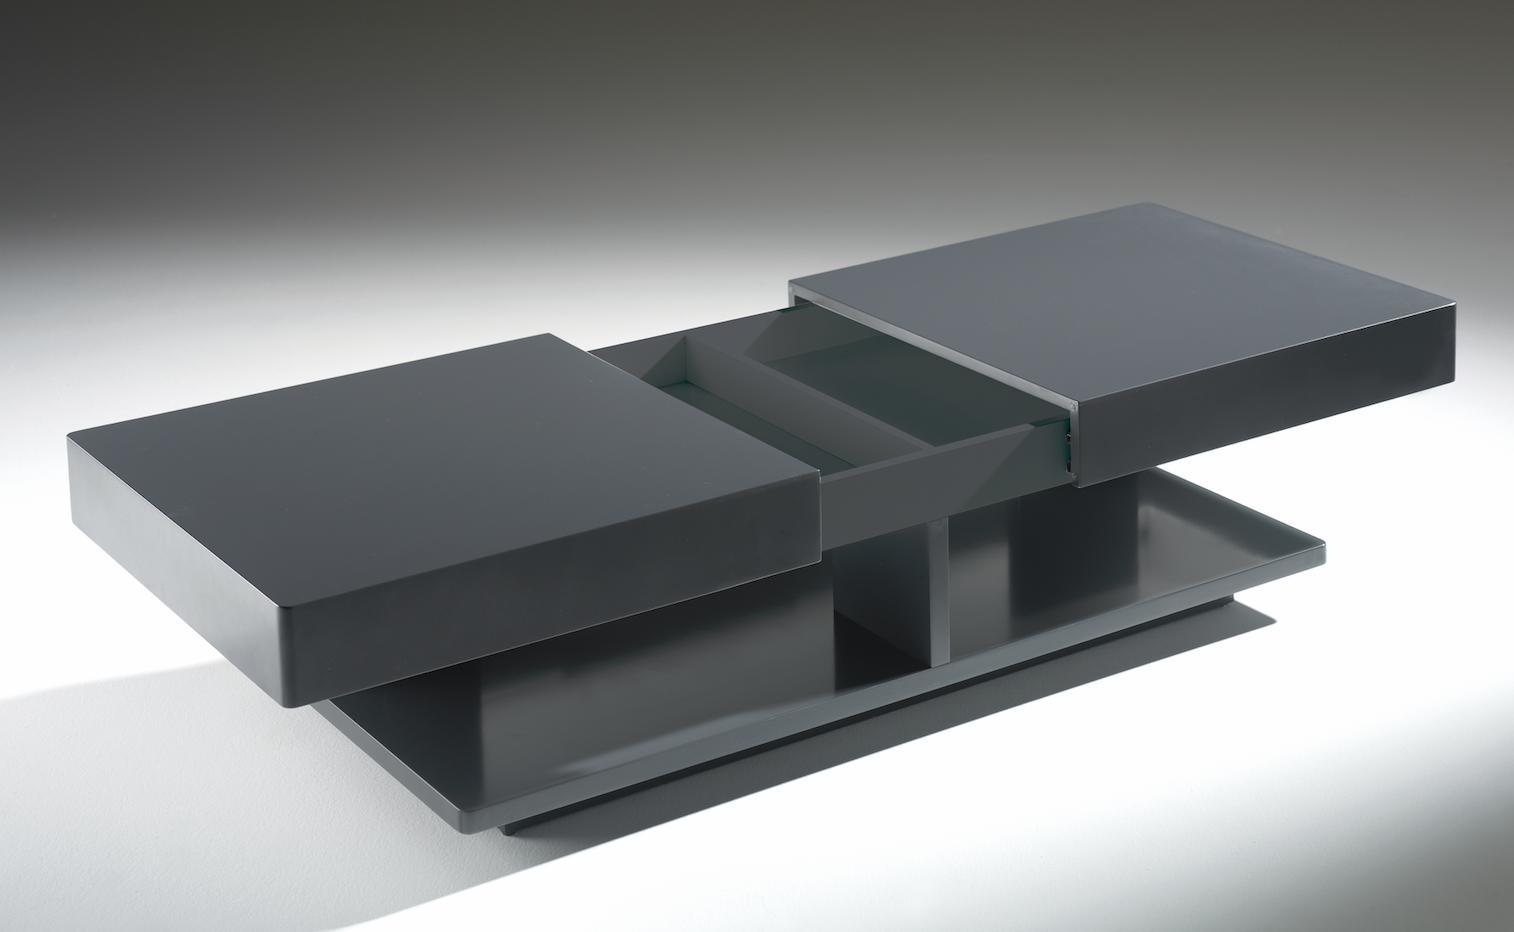 table basse avec plateau coulissant laqu gris galaxa. Black Bedroom Furniture Sets. Home Design Ideas